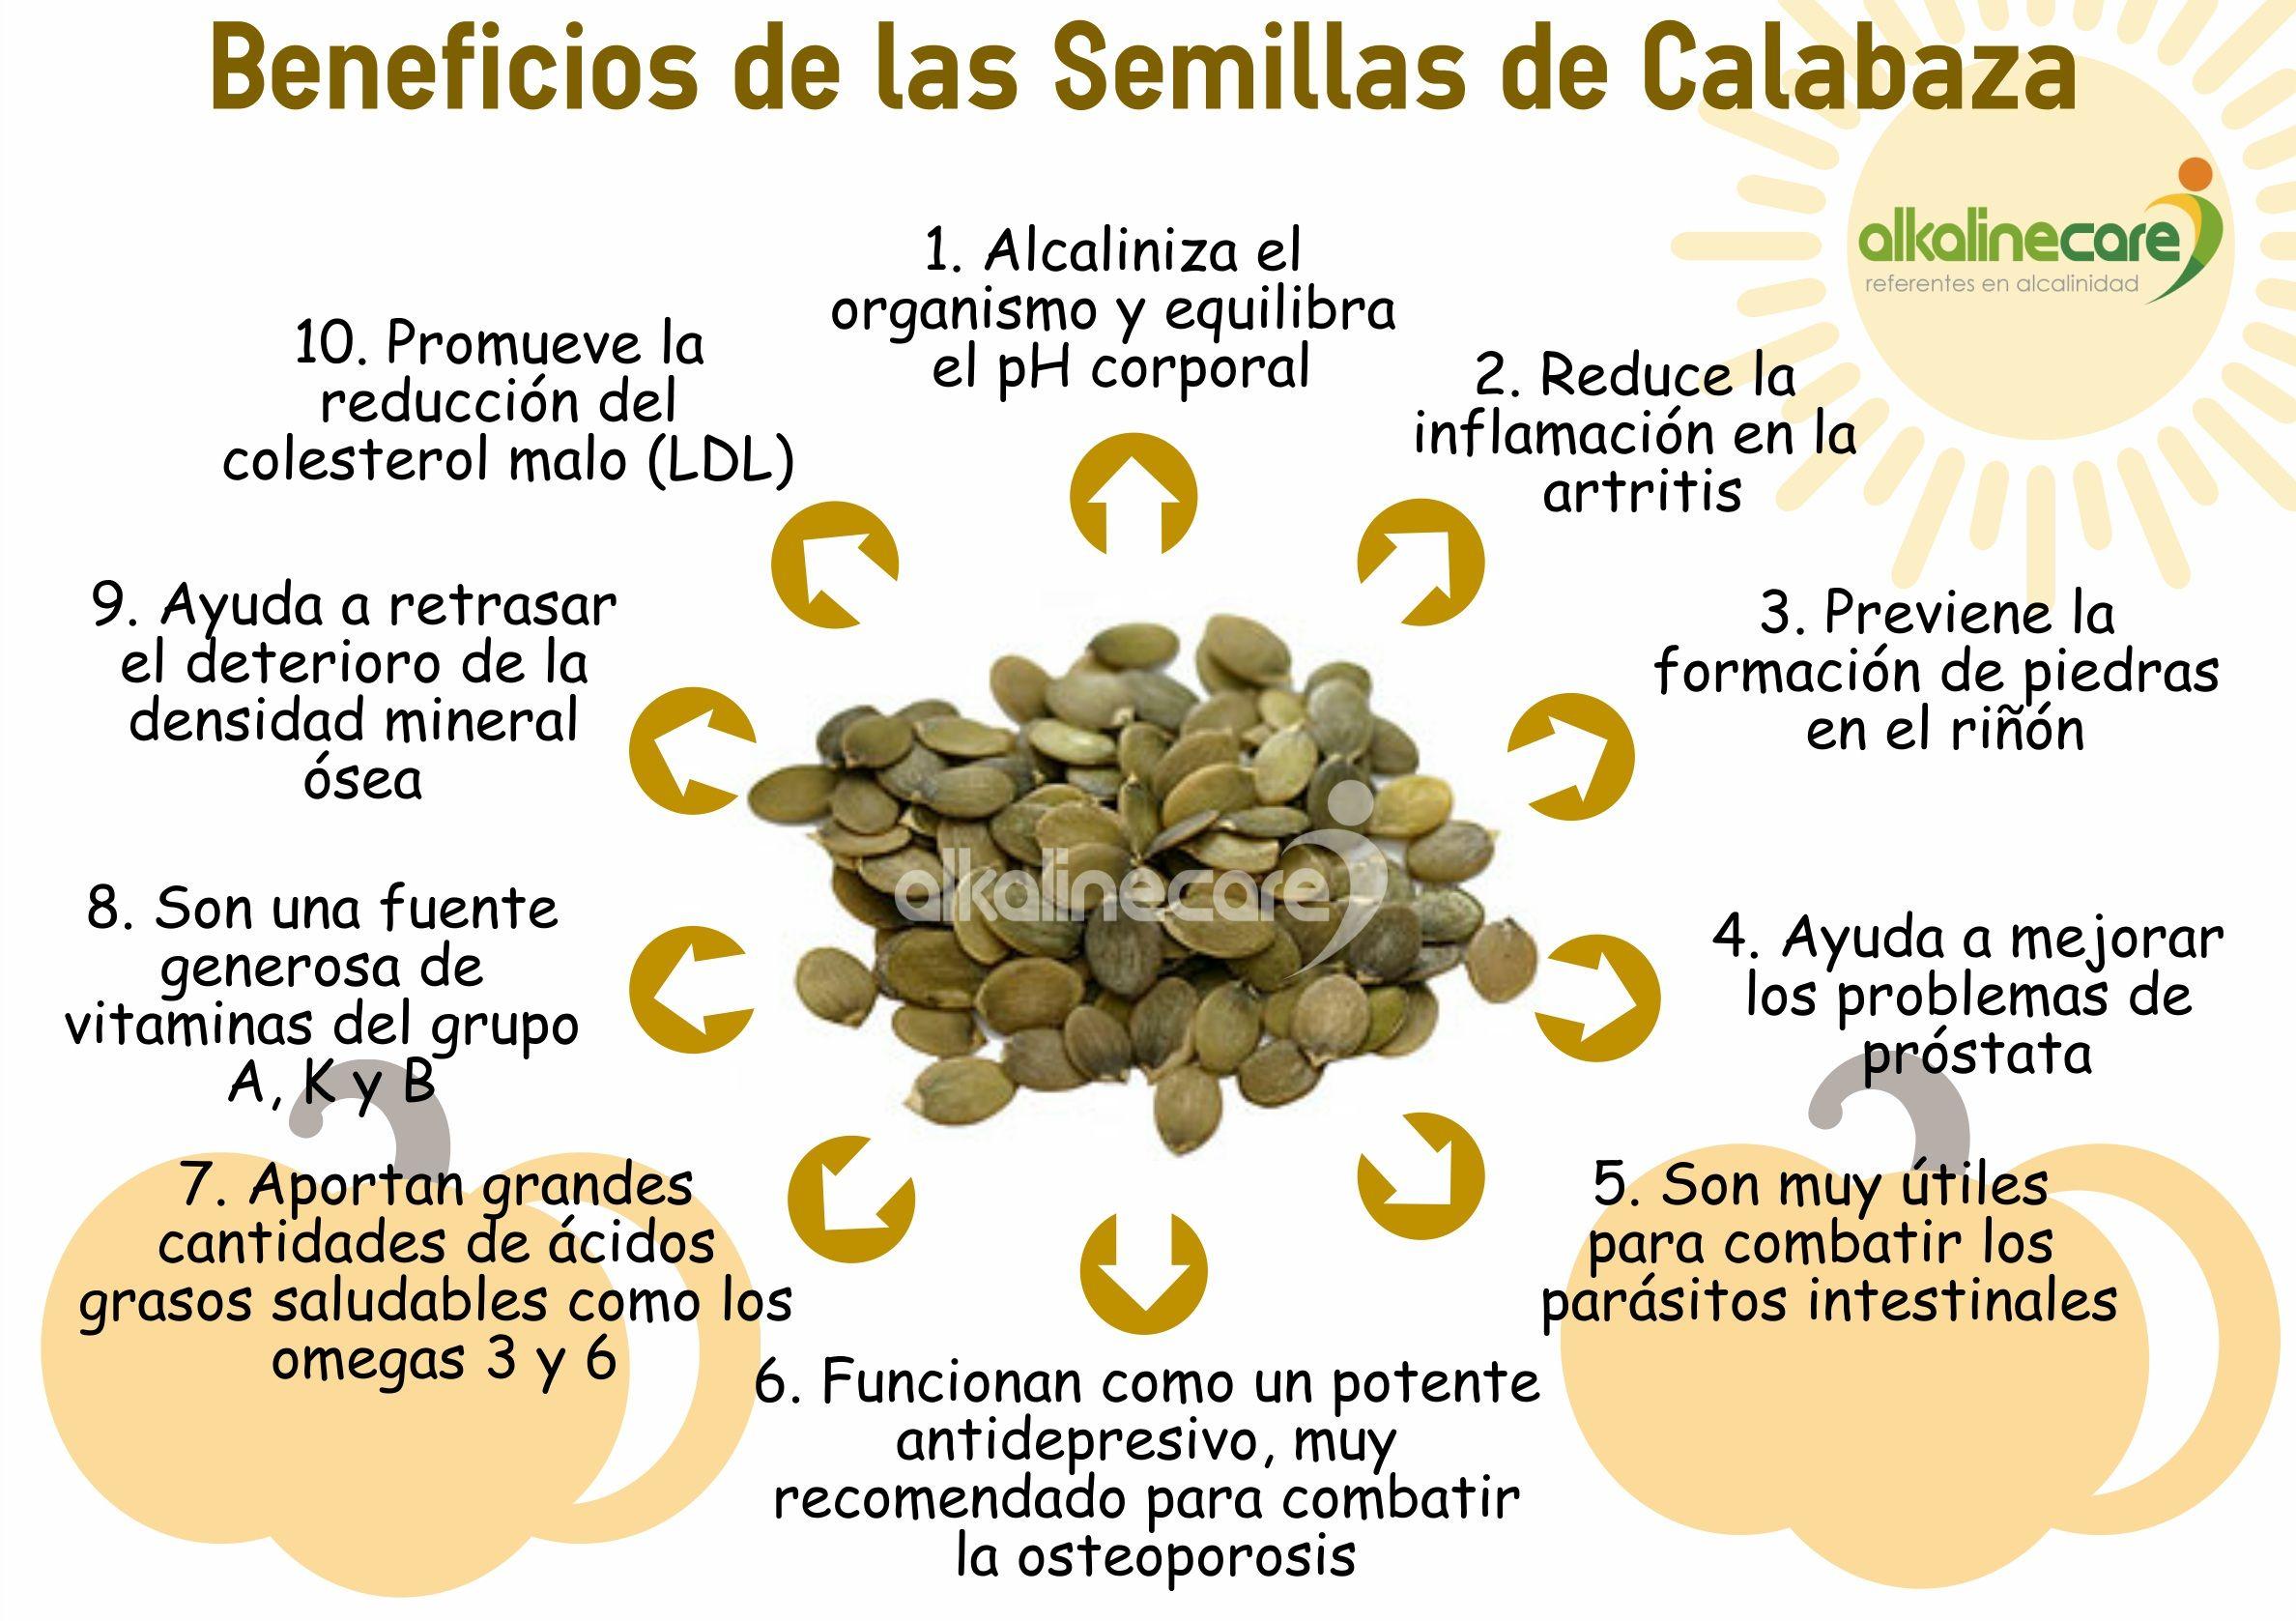 beneficios de solfa syllable semillas de calabaza